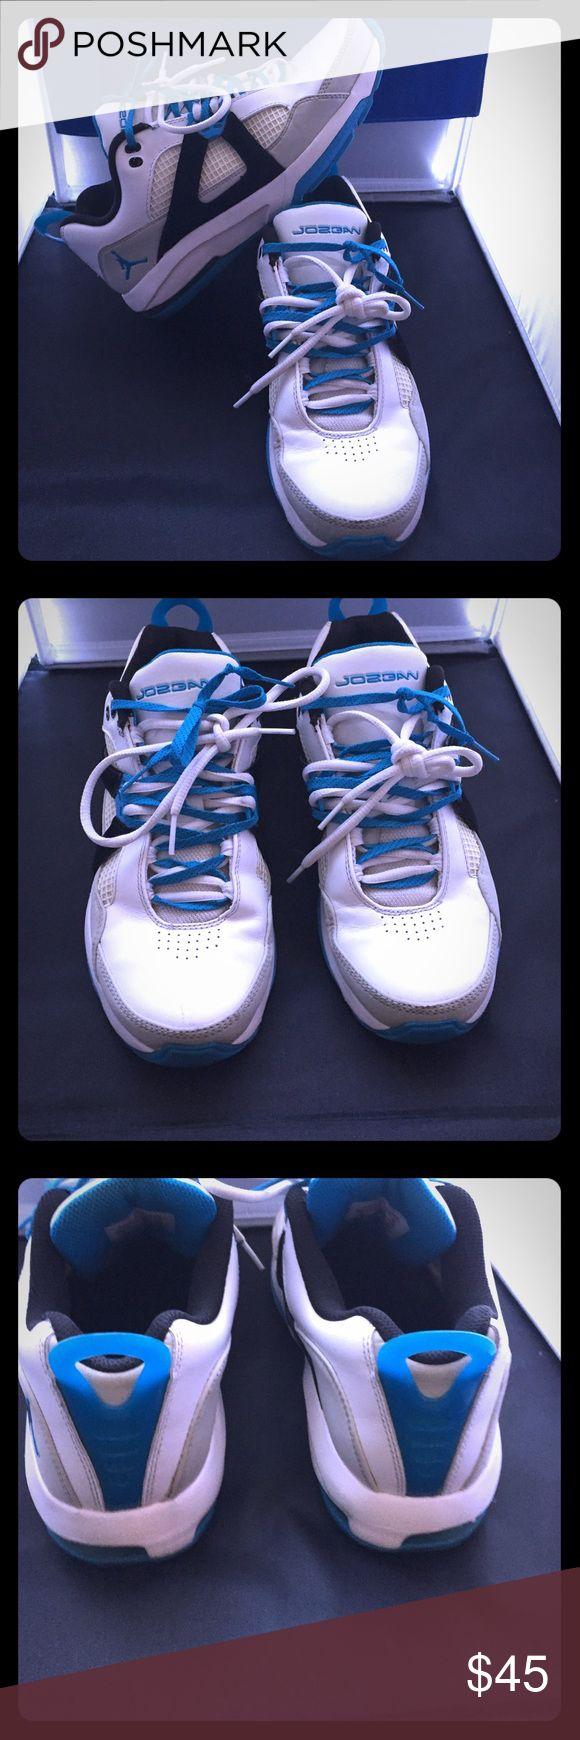 Men's turquoise white and black Jordan's Men's turquoise black and white Jordan's in good condition Jordan Shoes Sneakers